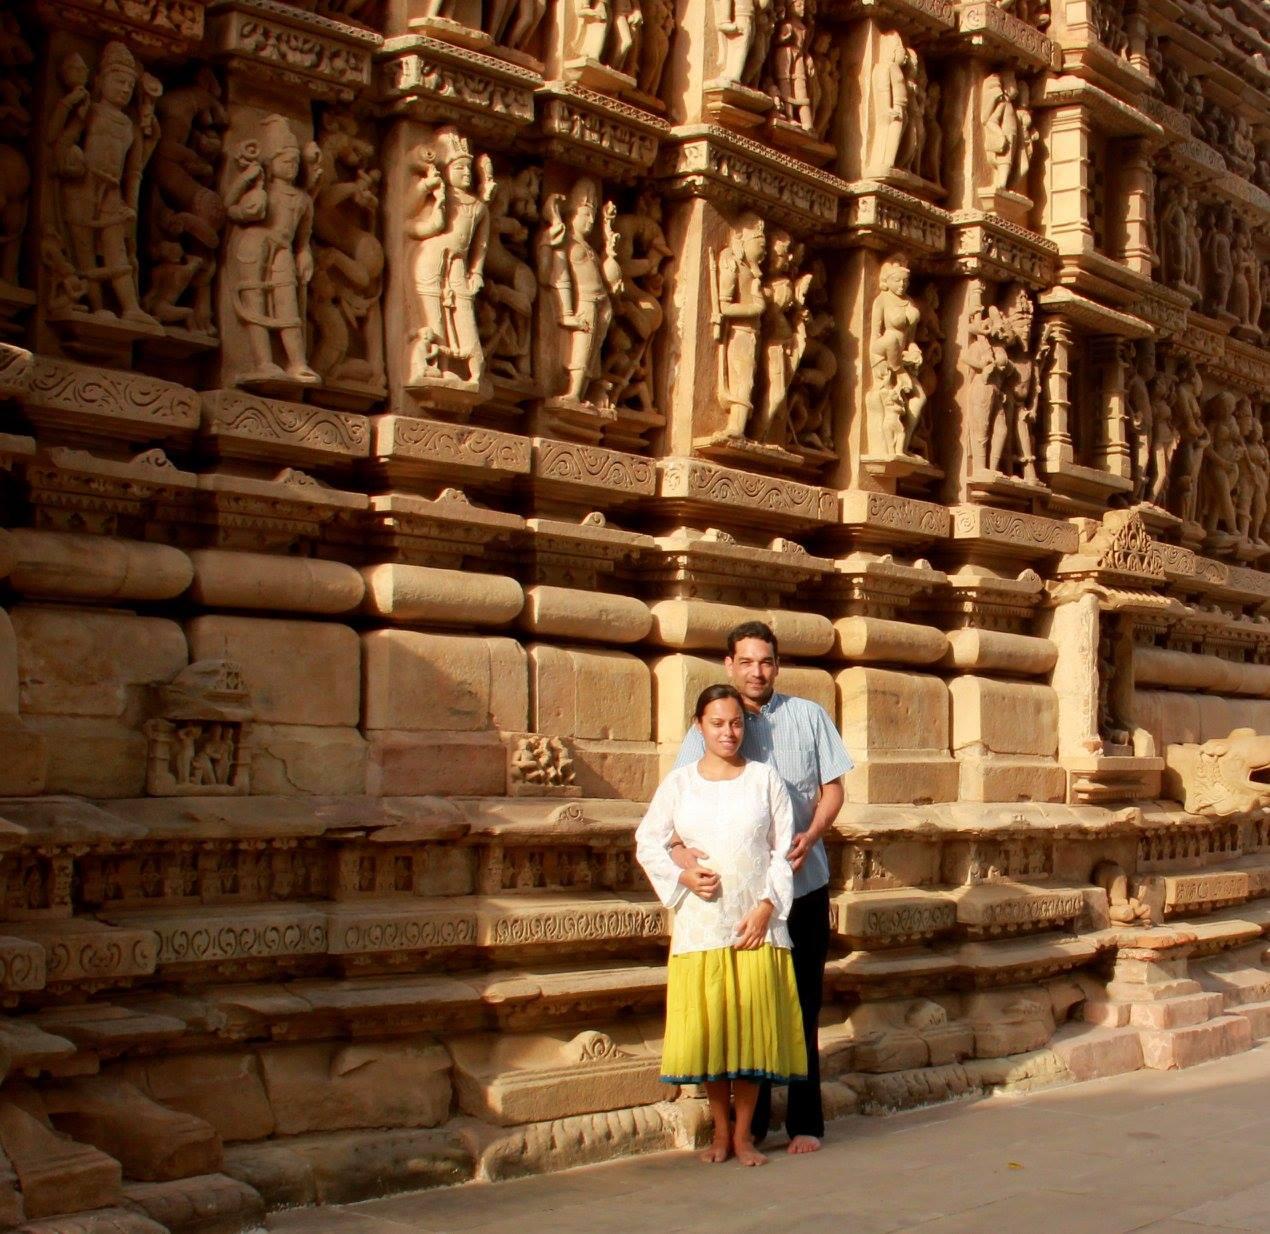 #travelbloggerindia #travelblogindia #travelingduringpregnancy